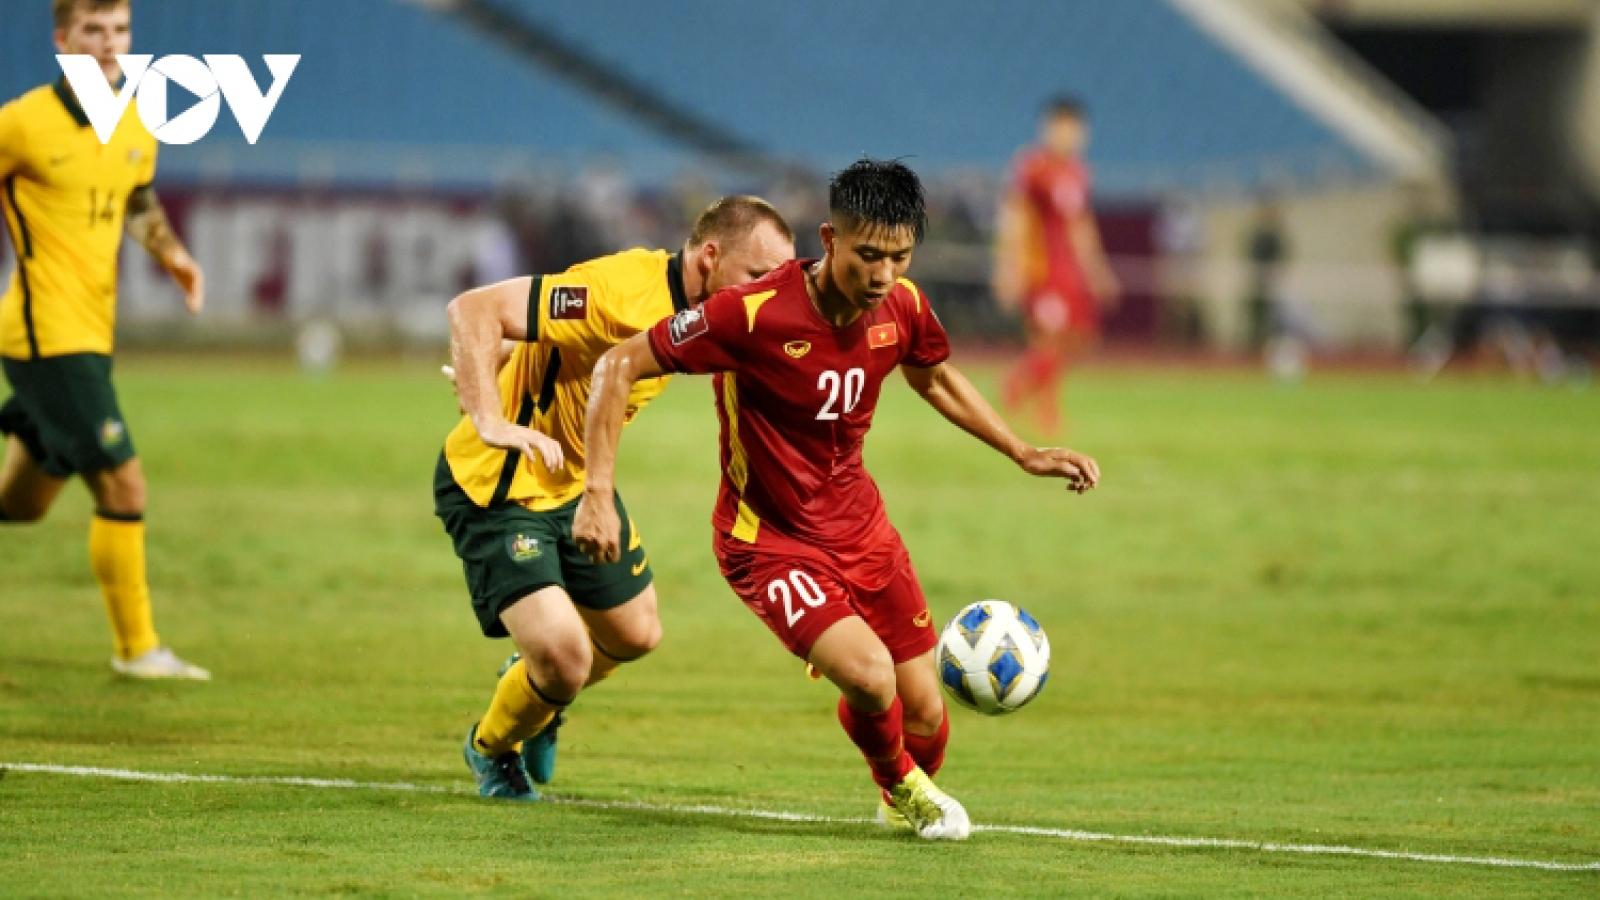 Australia defeat hosts Vietnam 1-0 in FIFA WC 2022 qualifier